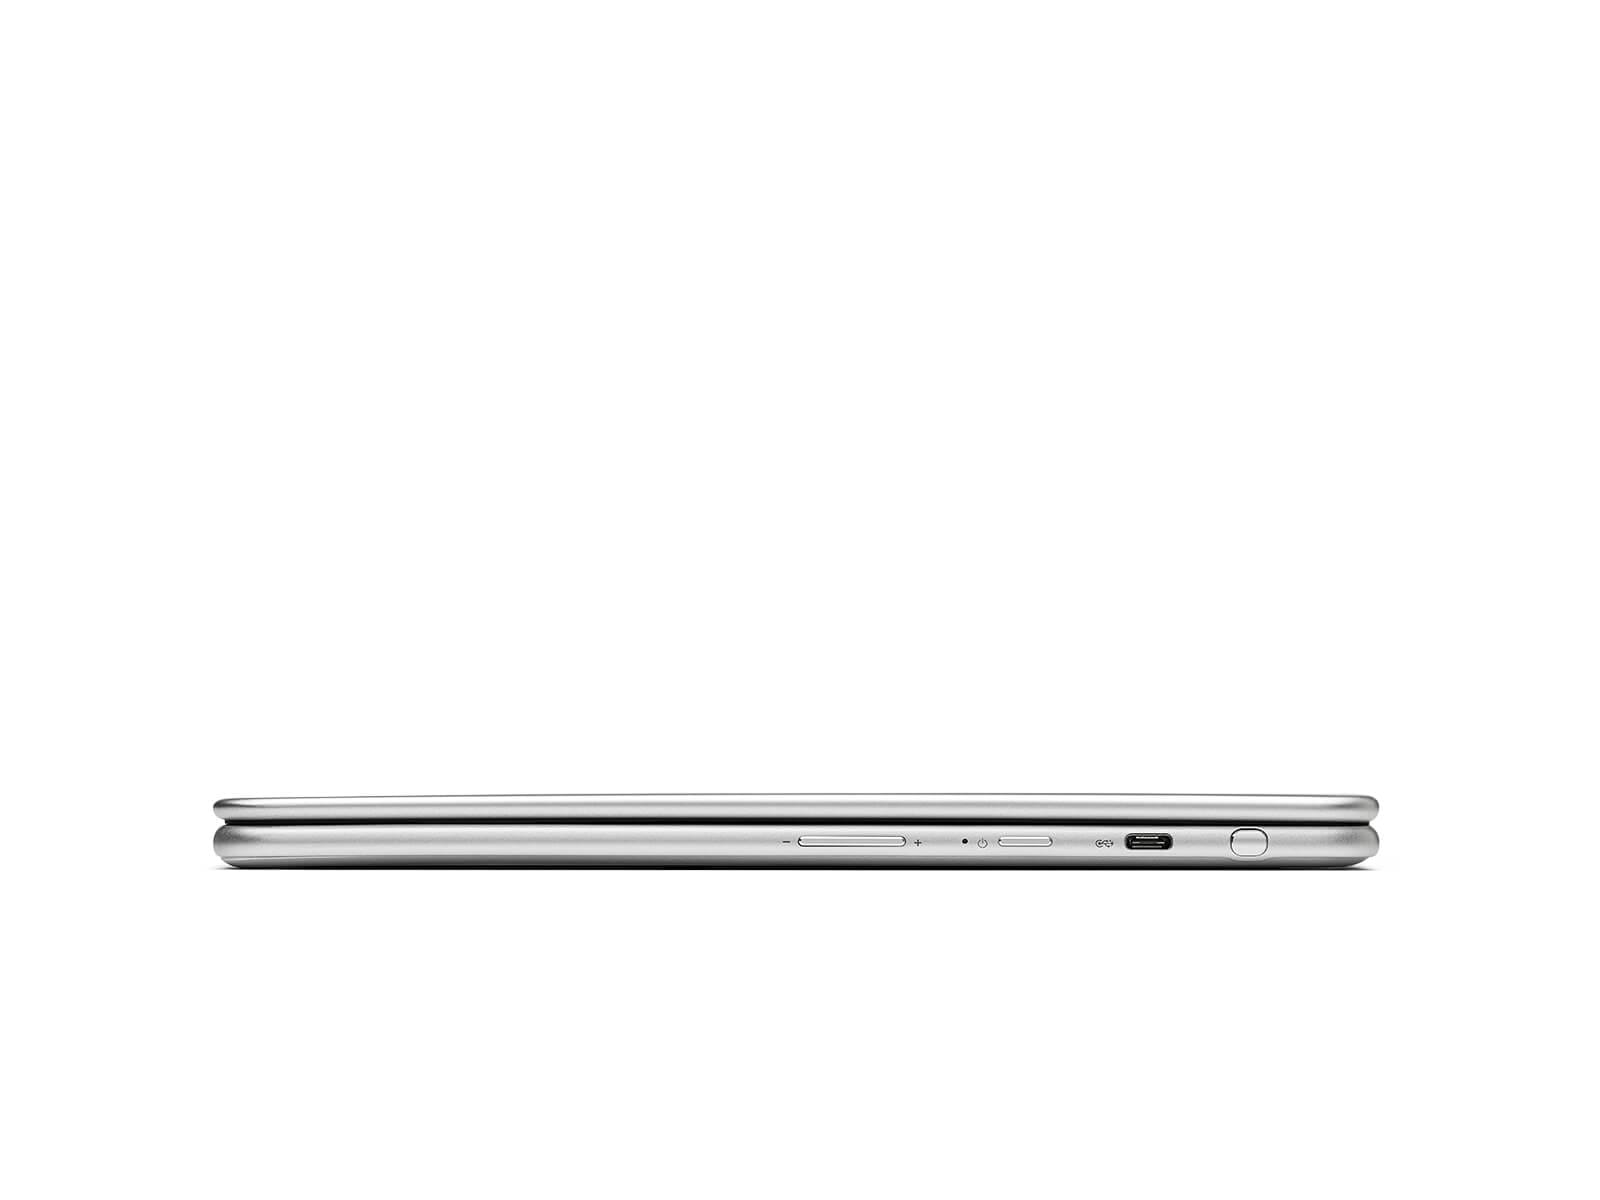 Samsung Chromebook Plus - photo 11